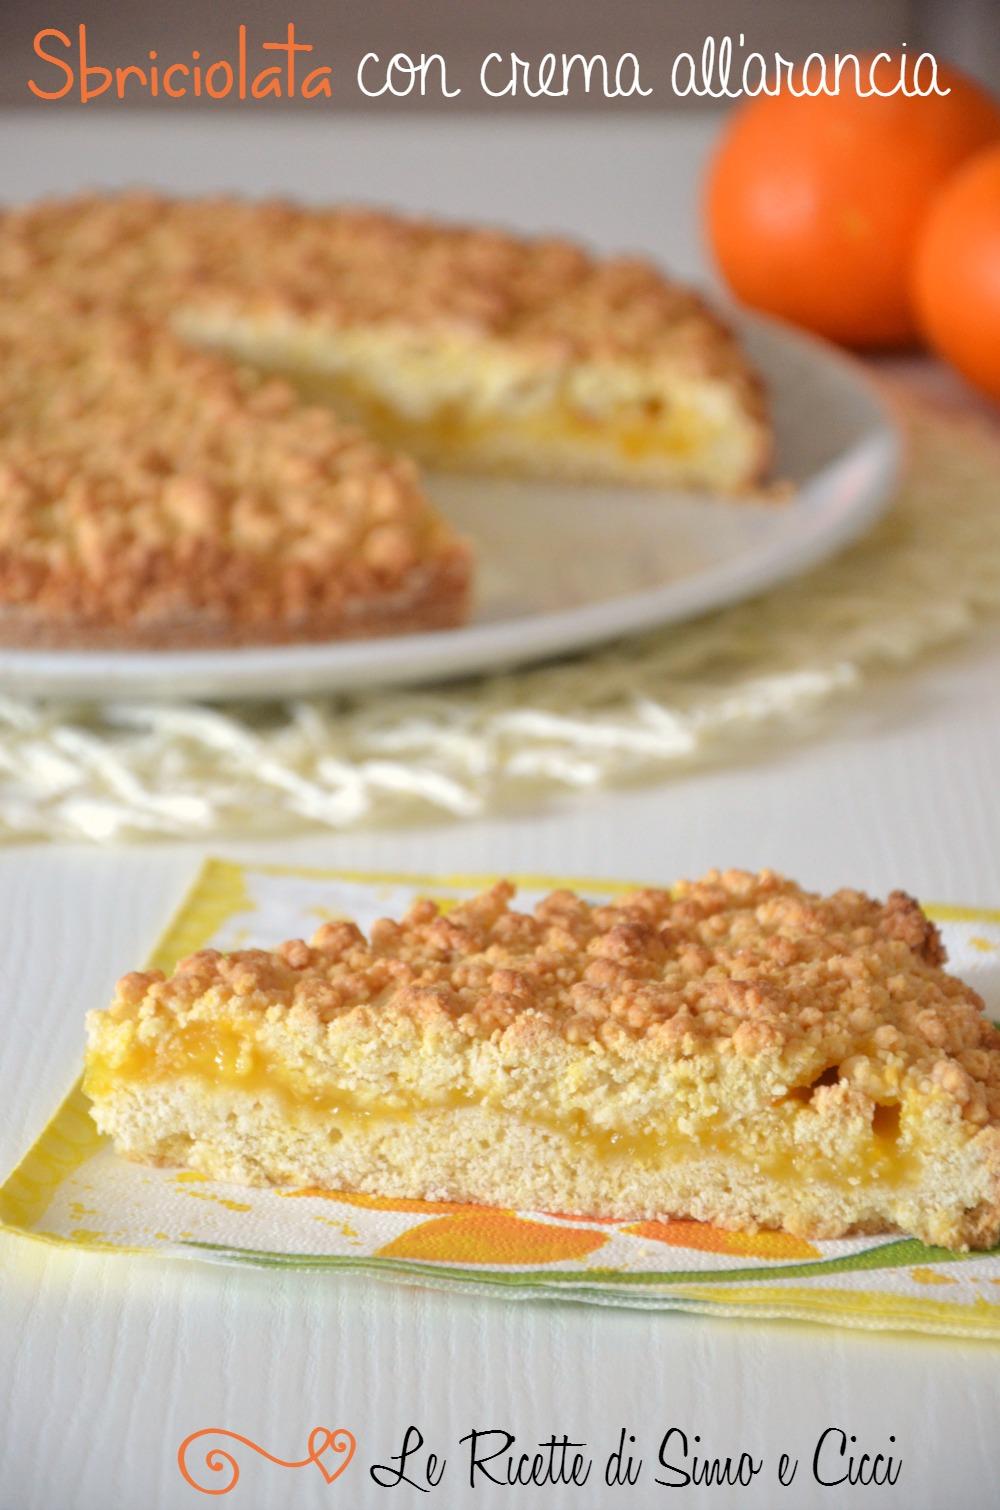 Sbriciolata con crema all'arancia